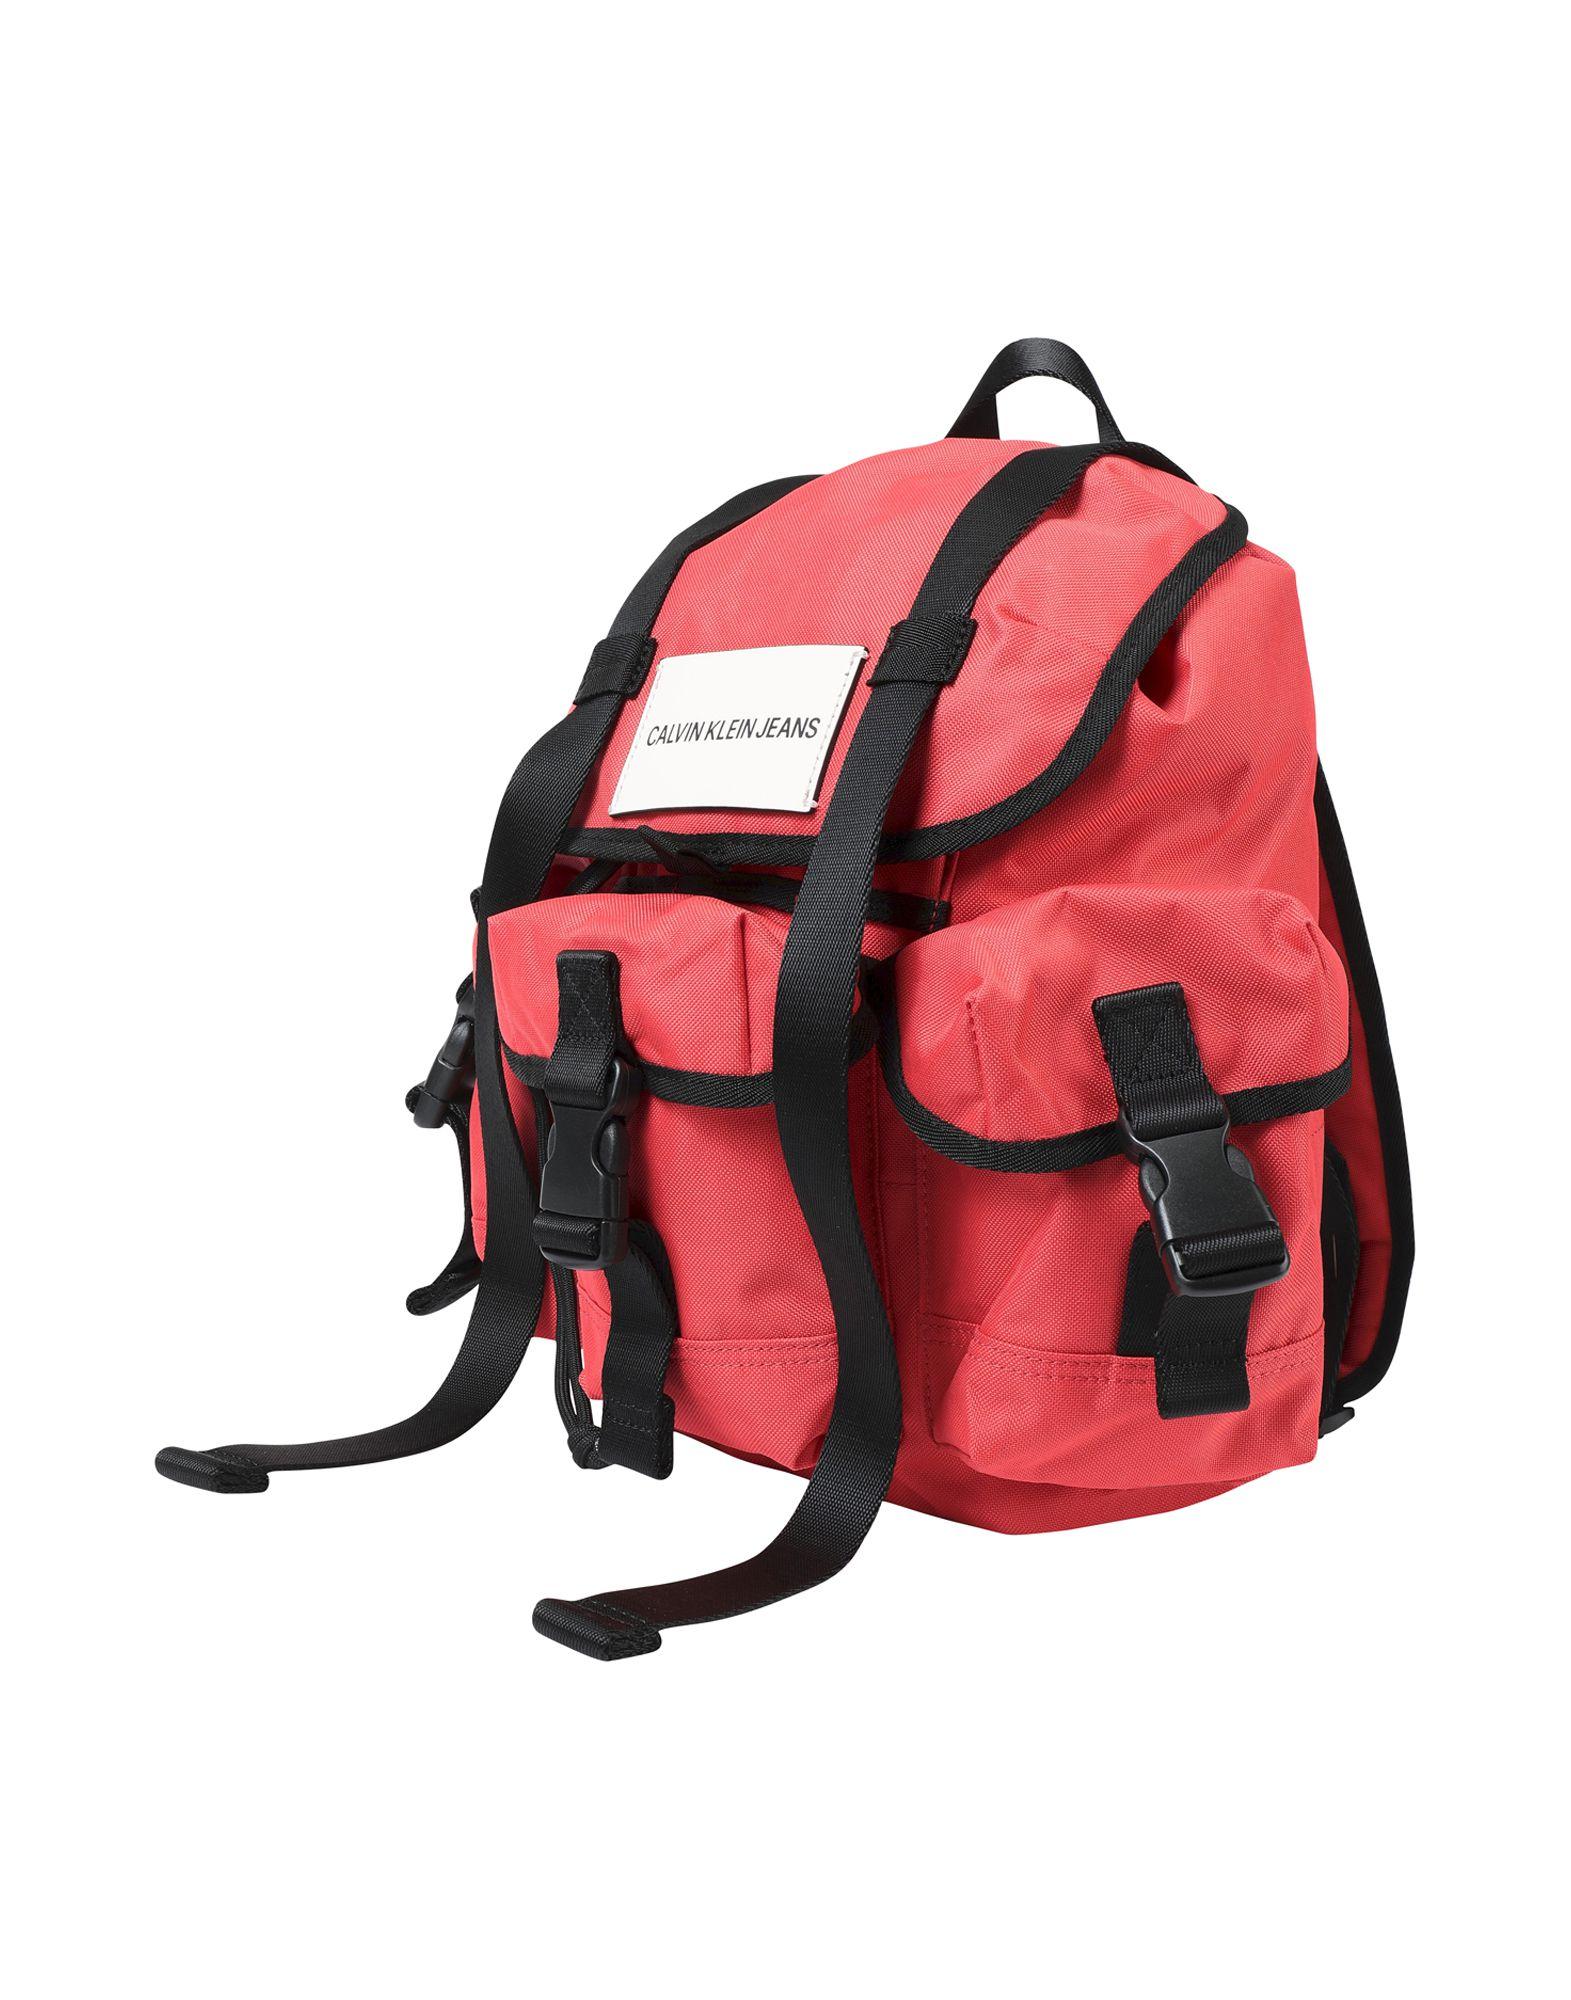 купить CALVIN KLEIN JEANS Рюкзаки и сумки на пояс по цене 10130 рублей